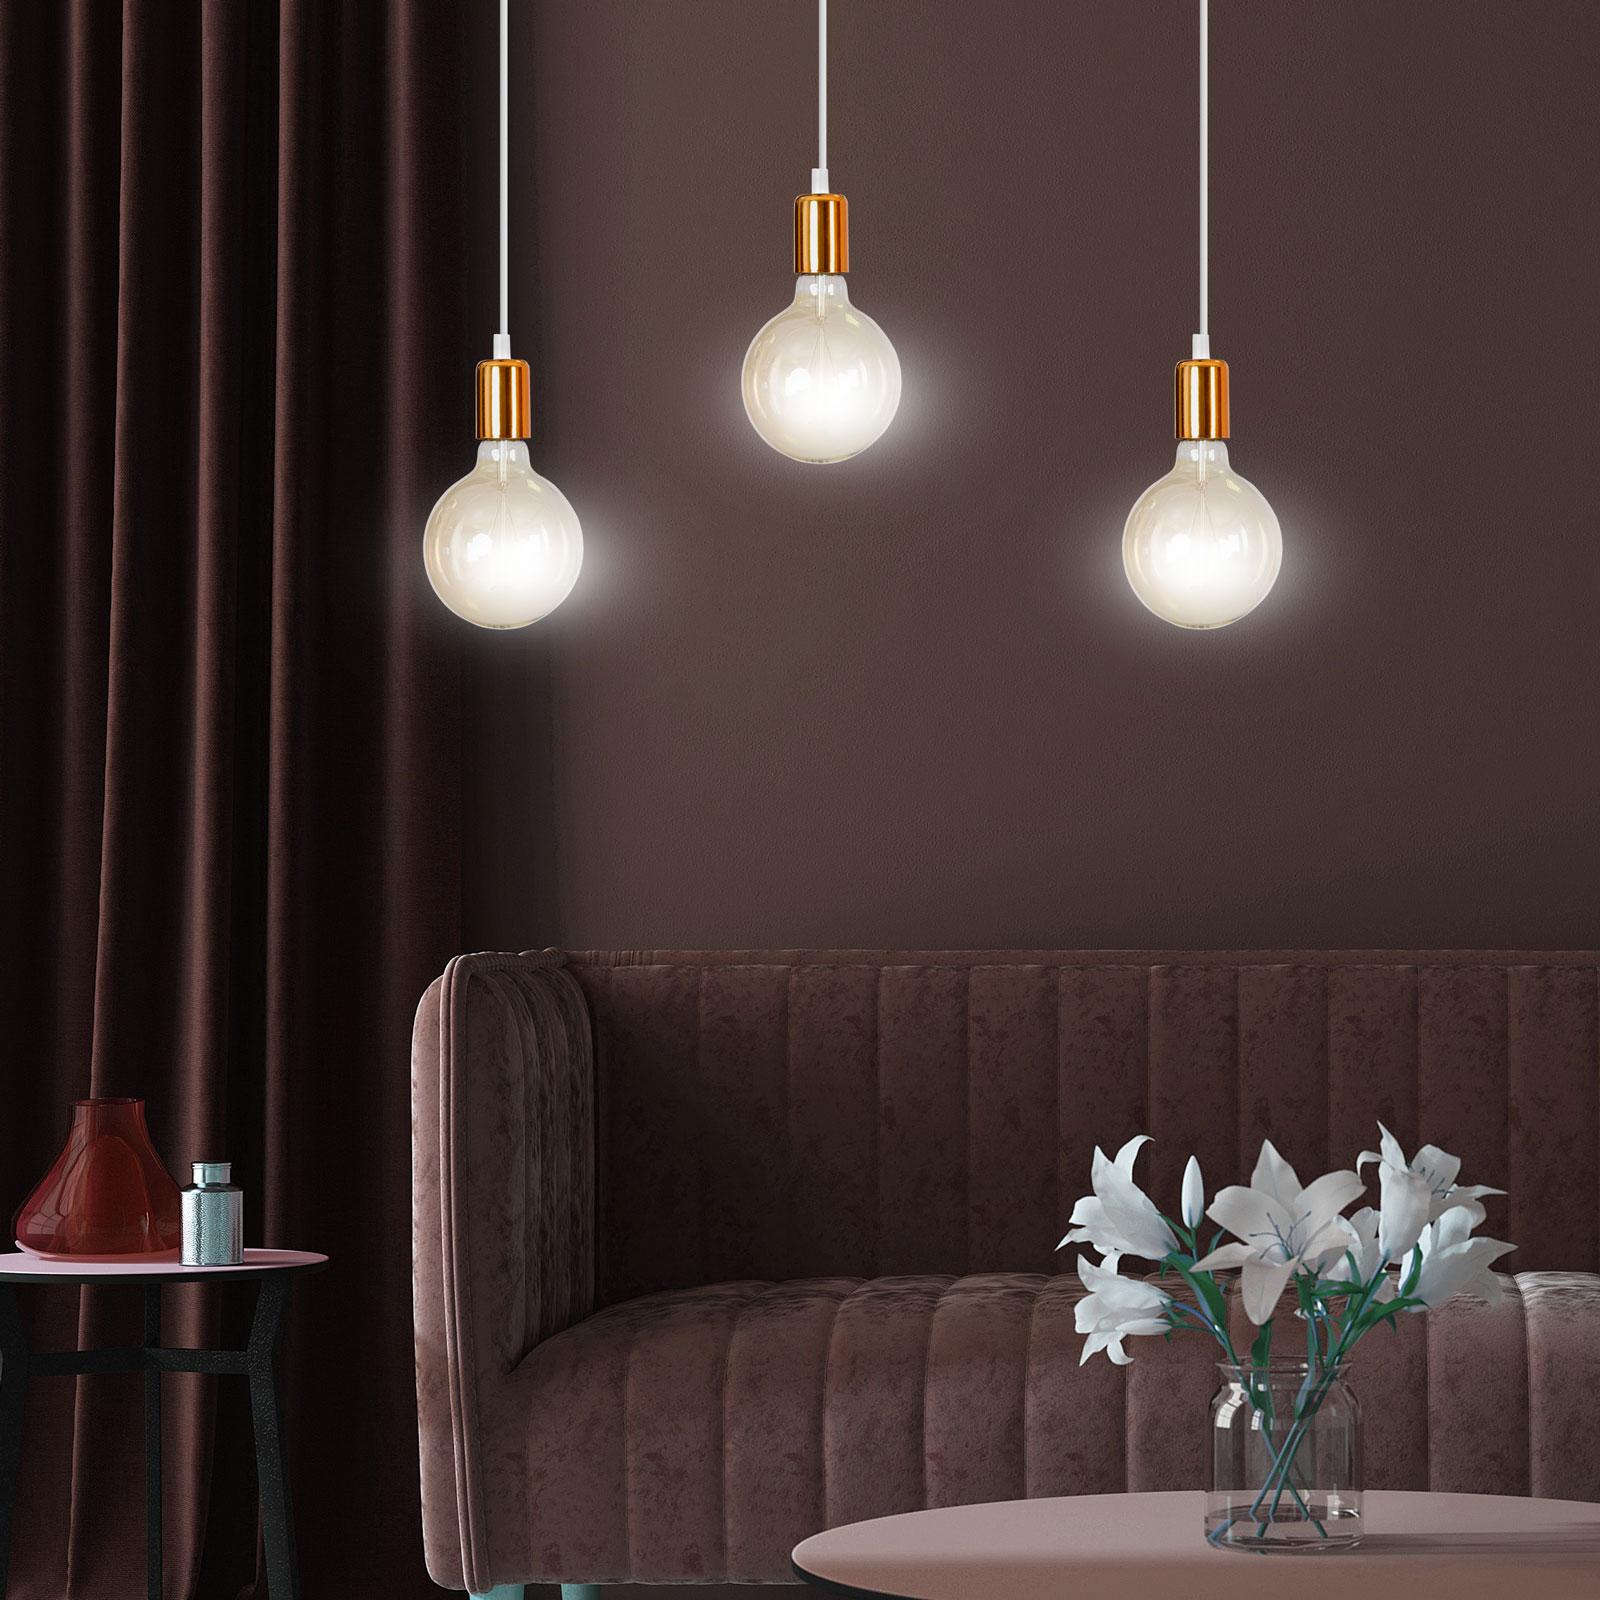 Hanglamp Spark 3 3-lamps, wit-koper